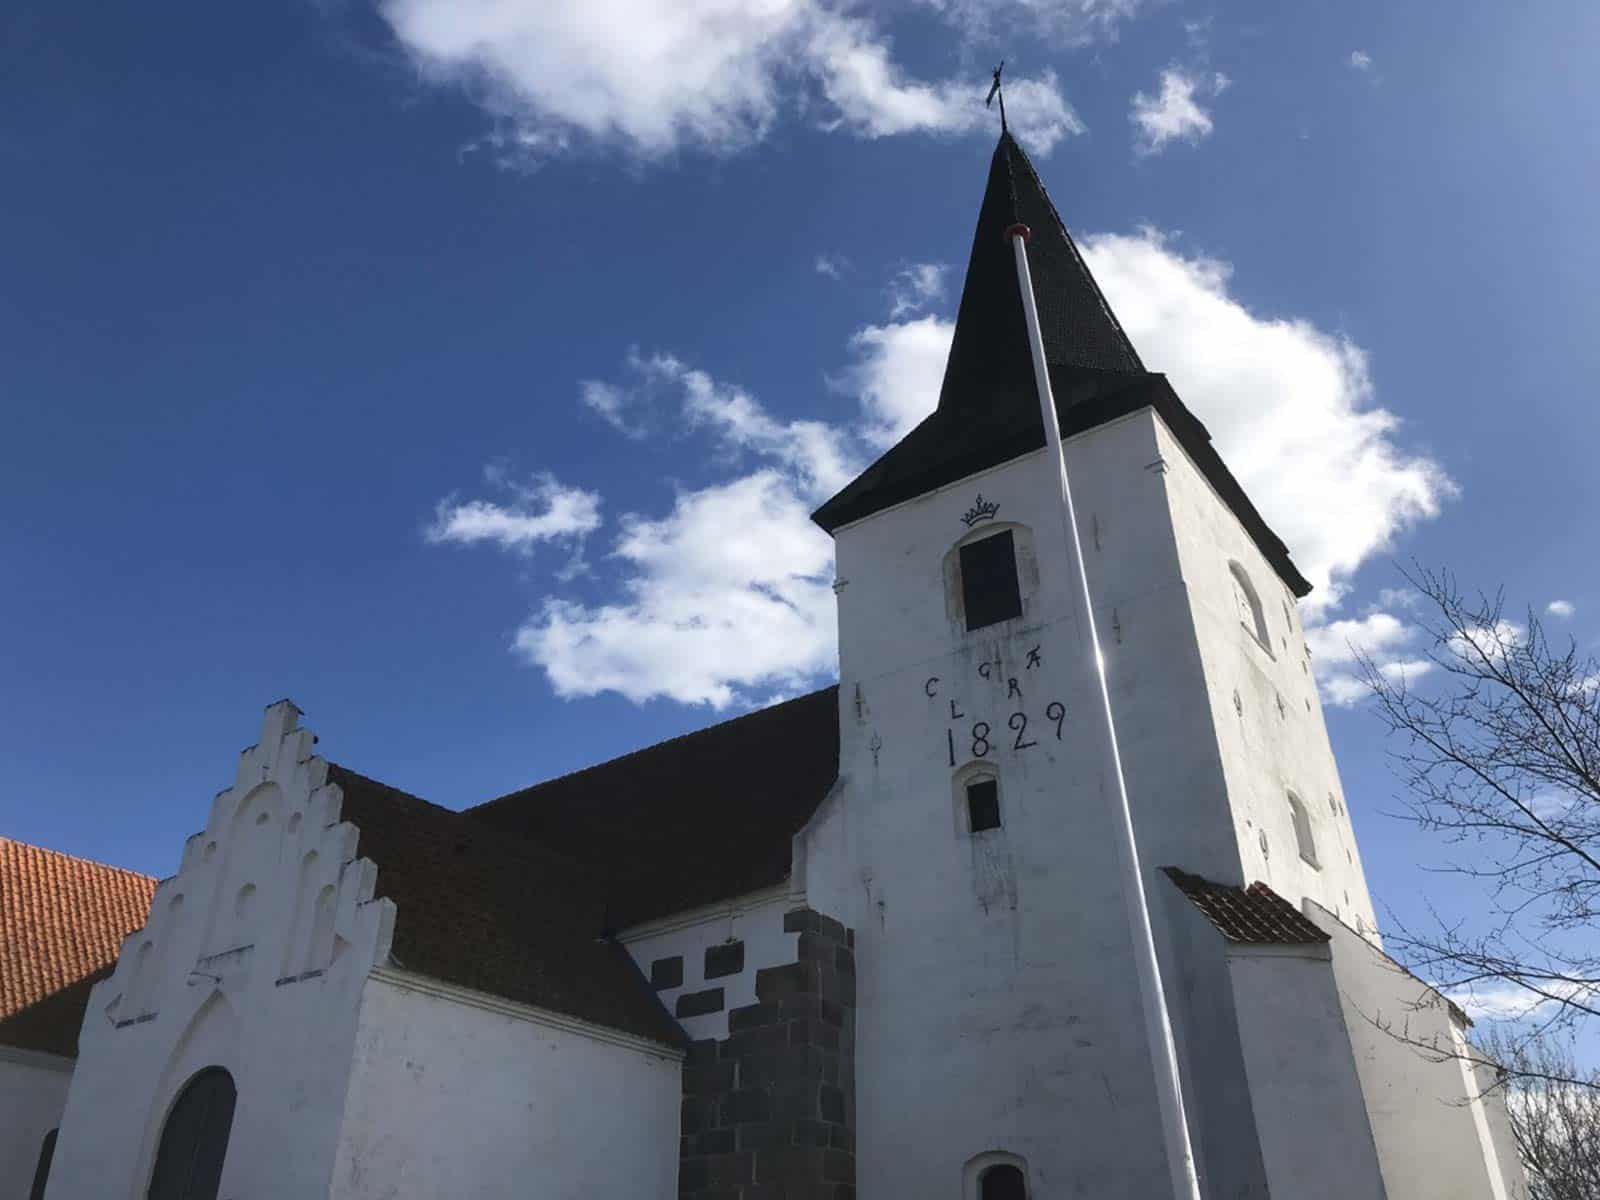 Magleby Kirke kirketårn